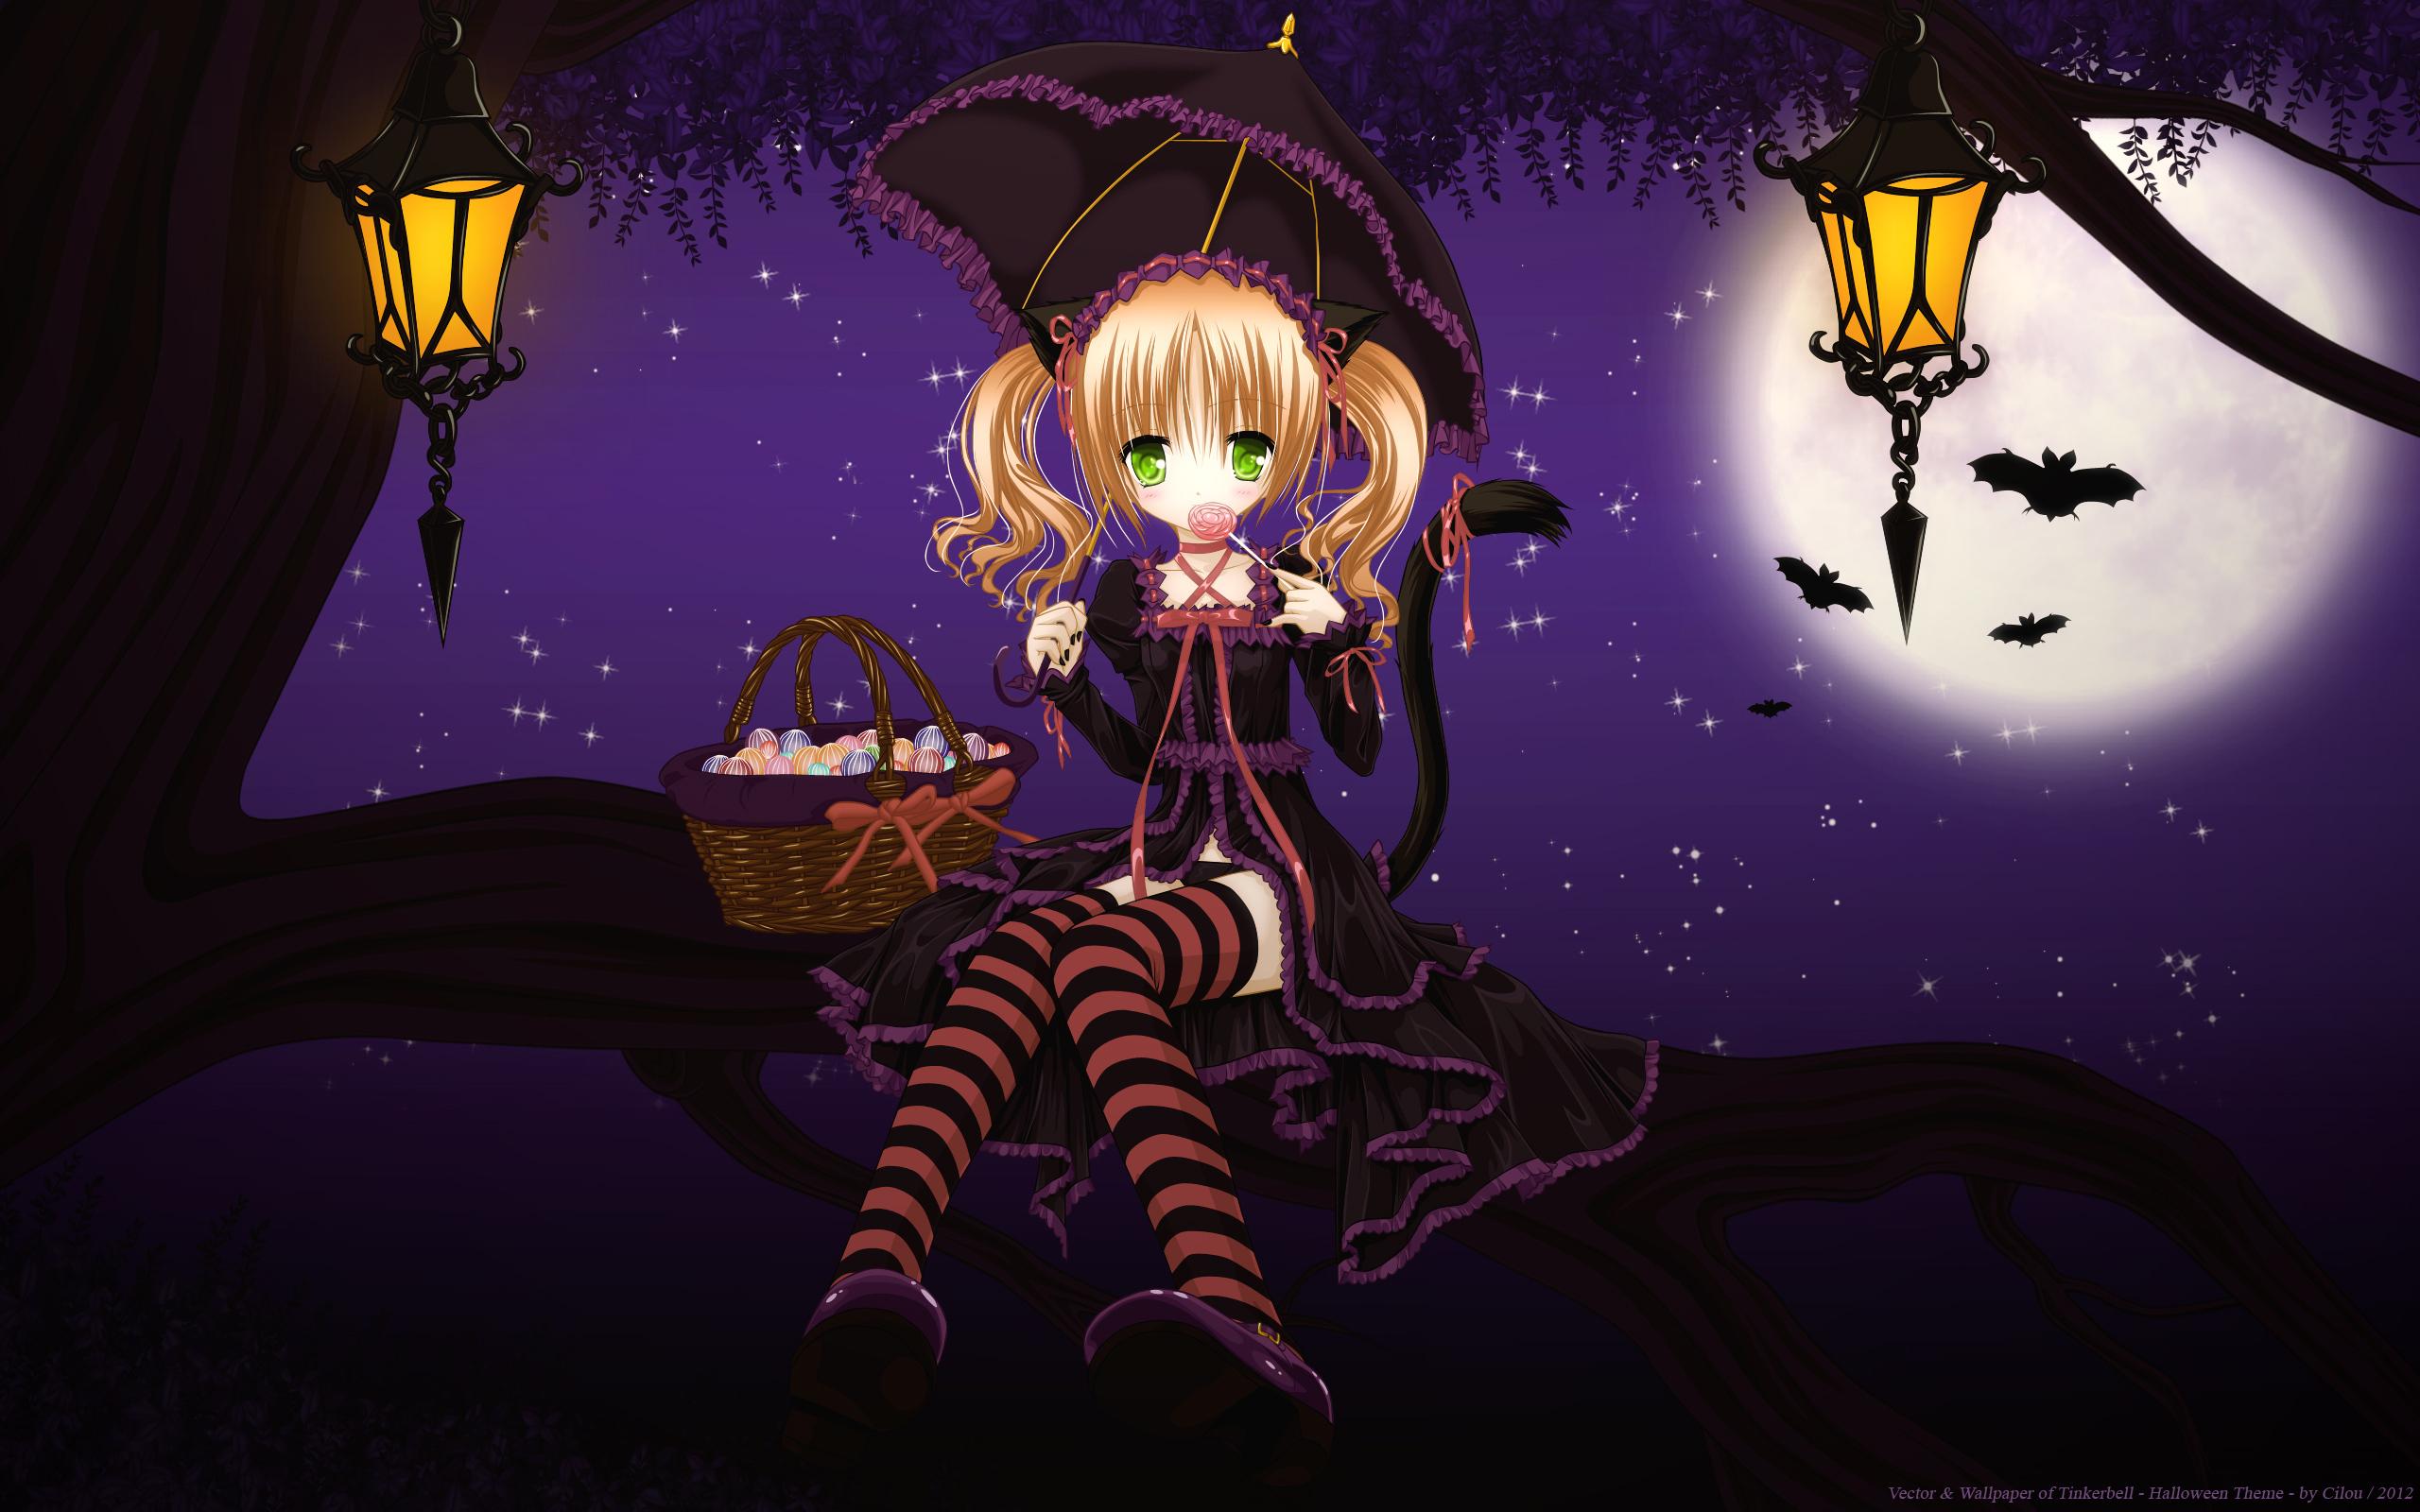 Cute halloween anime girl wallpaper   ForWallpapercom 2560x1600